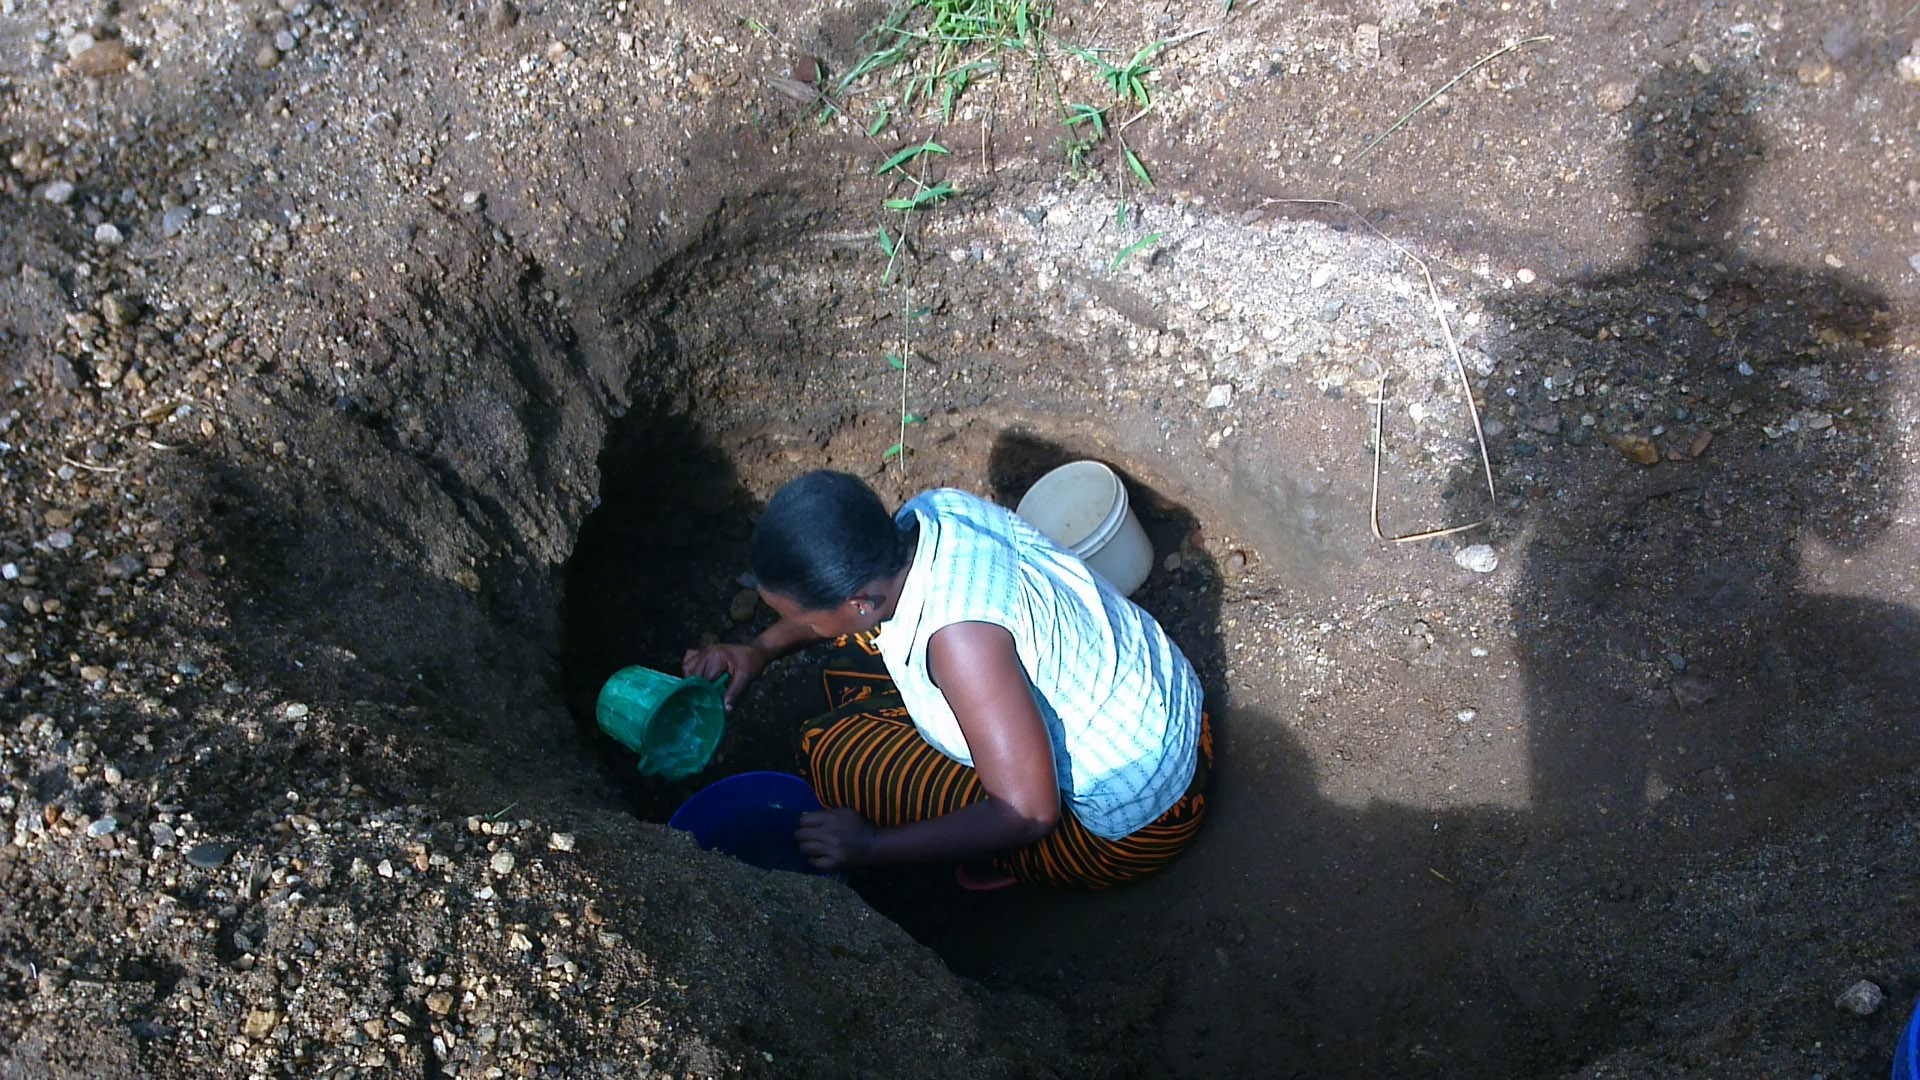 Unsafe water raises COVID-19 risks in Mbeya, Tanzania